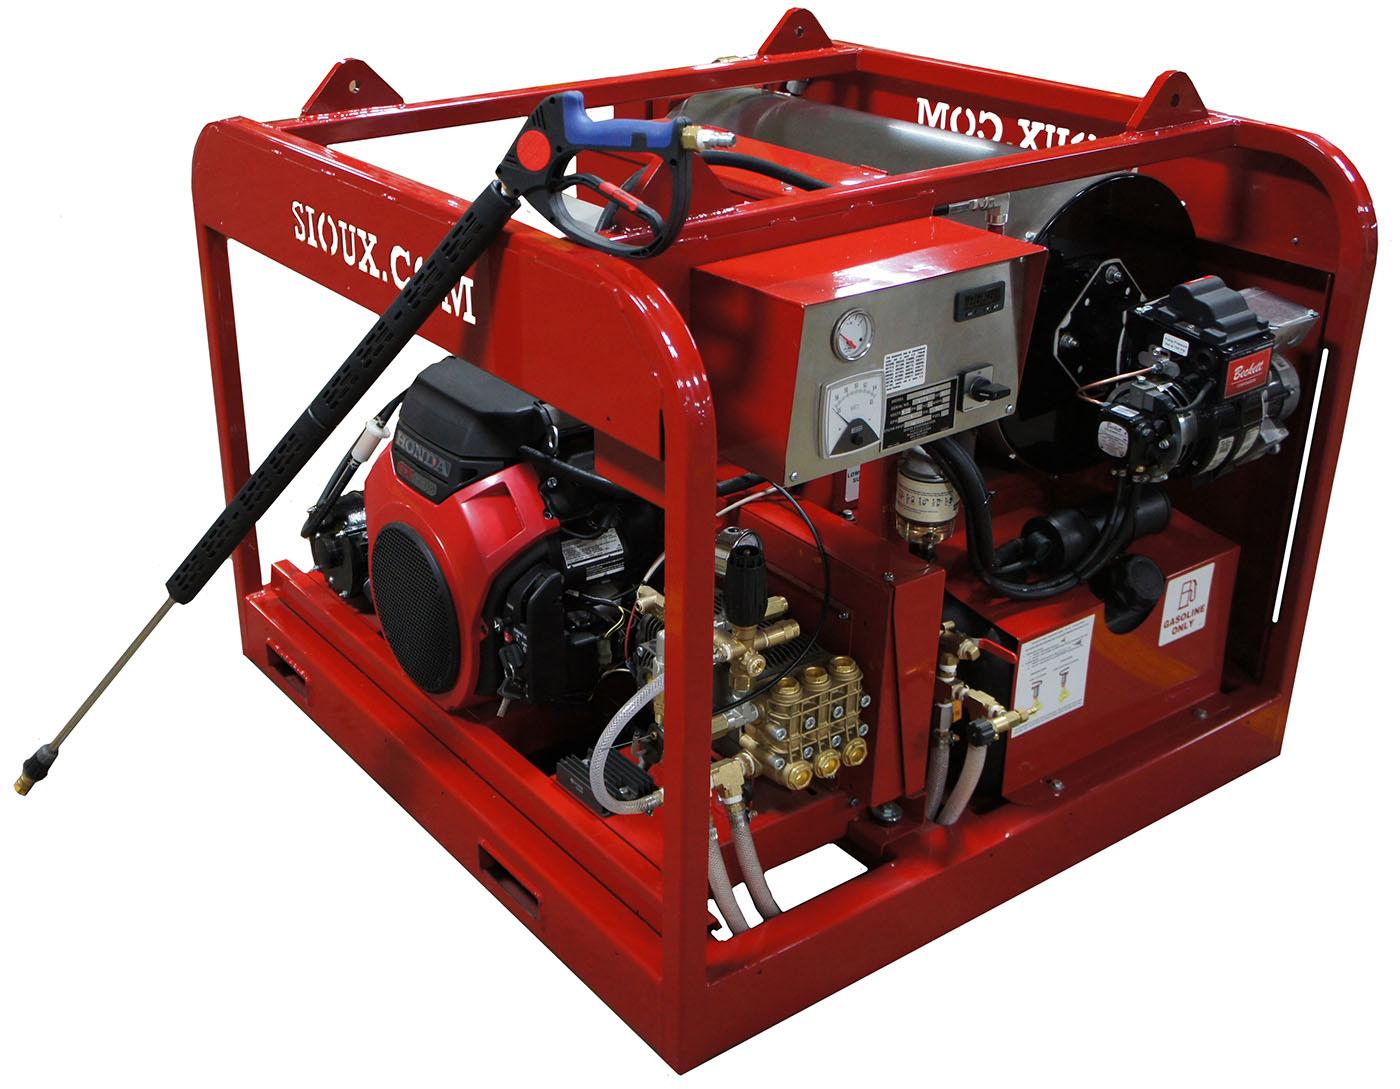 H5D3500-G Pressure Washer